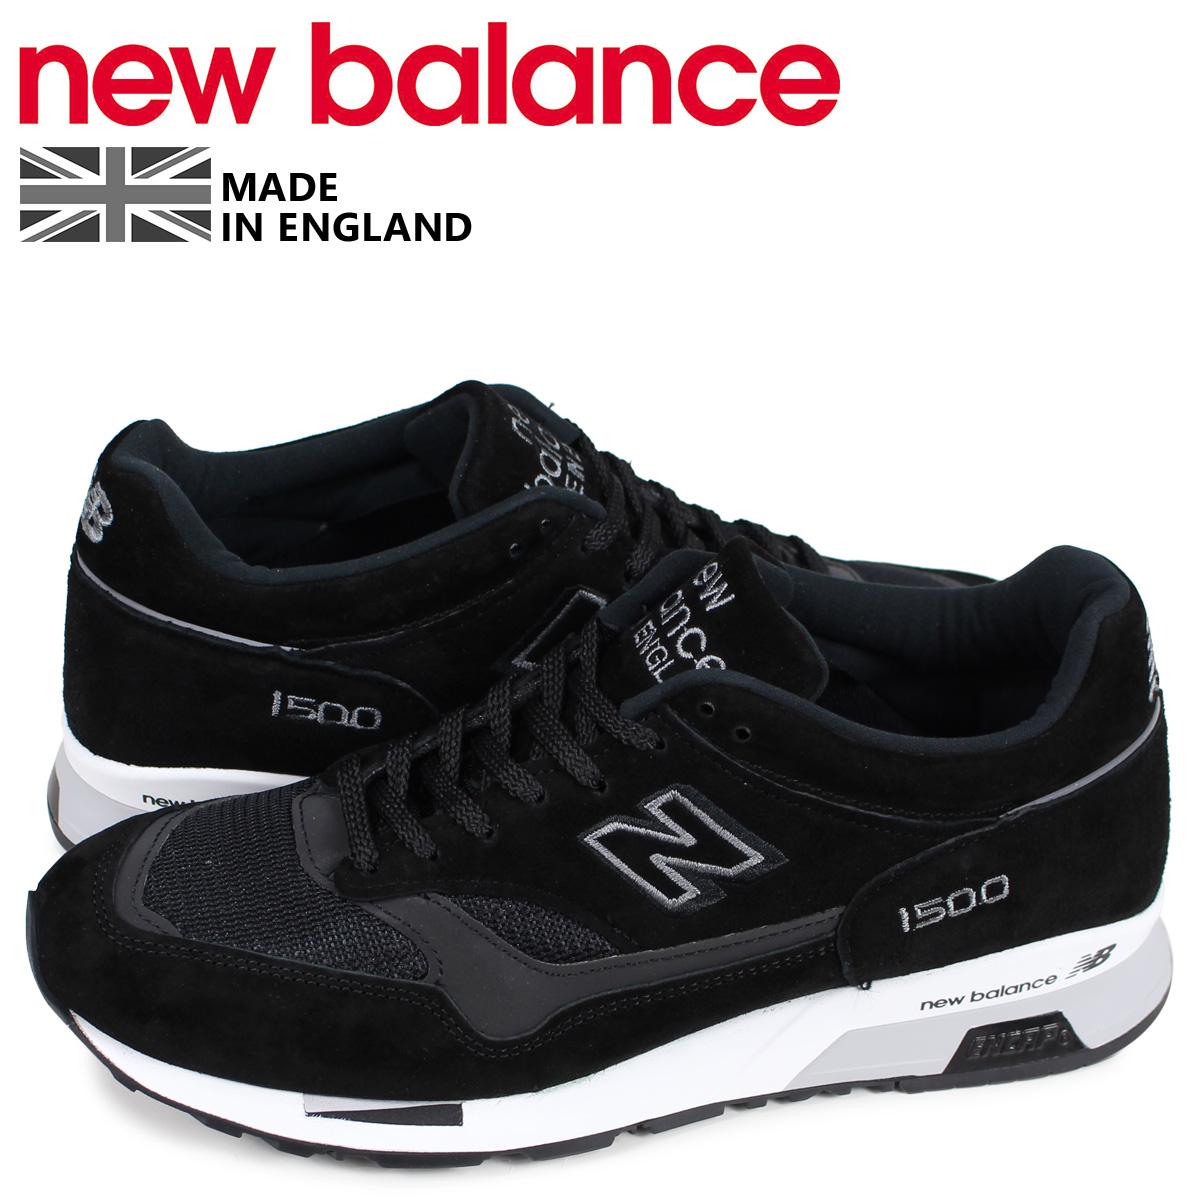 premium selection 08eb9 769cd New Balance new balance 1500 sneakers men D Wise MADE IN UK black black  M1500JKK